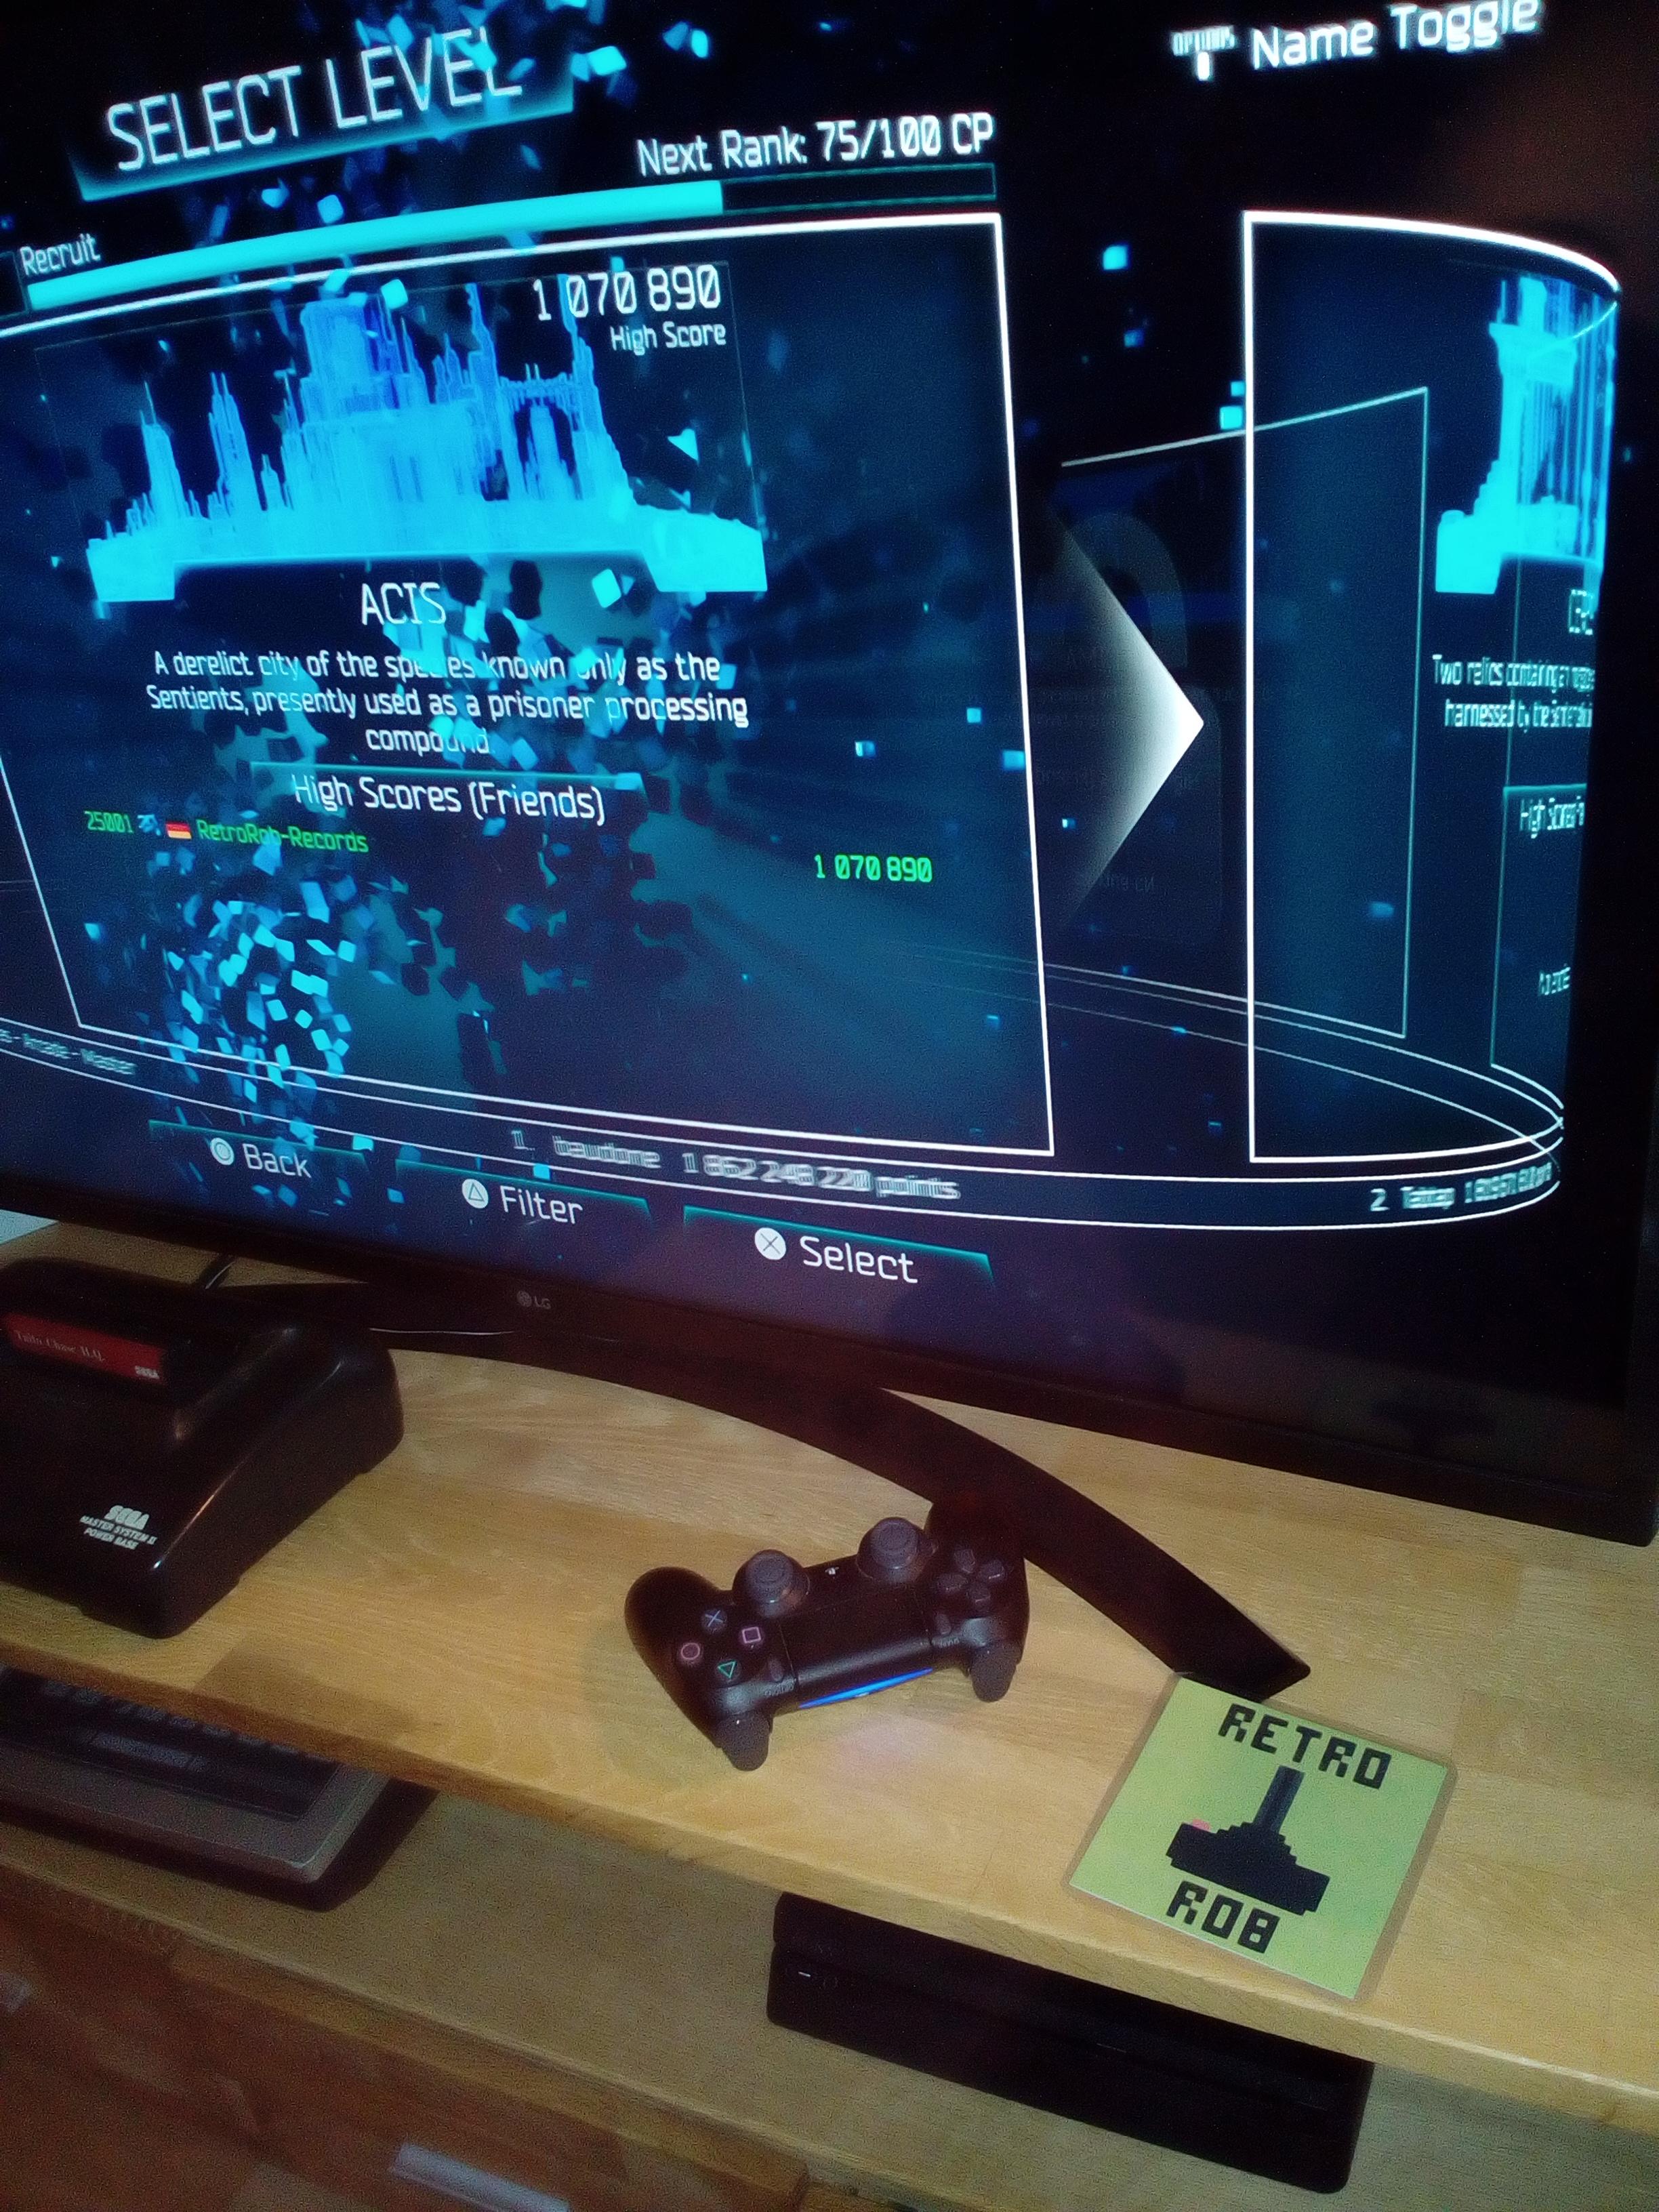 RetroRob: Resogun [Single Level/Rookie] Acis (Playstation 4) 1,070,890 points on 2020-12-31 05:33:20